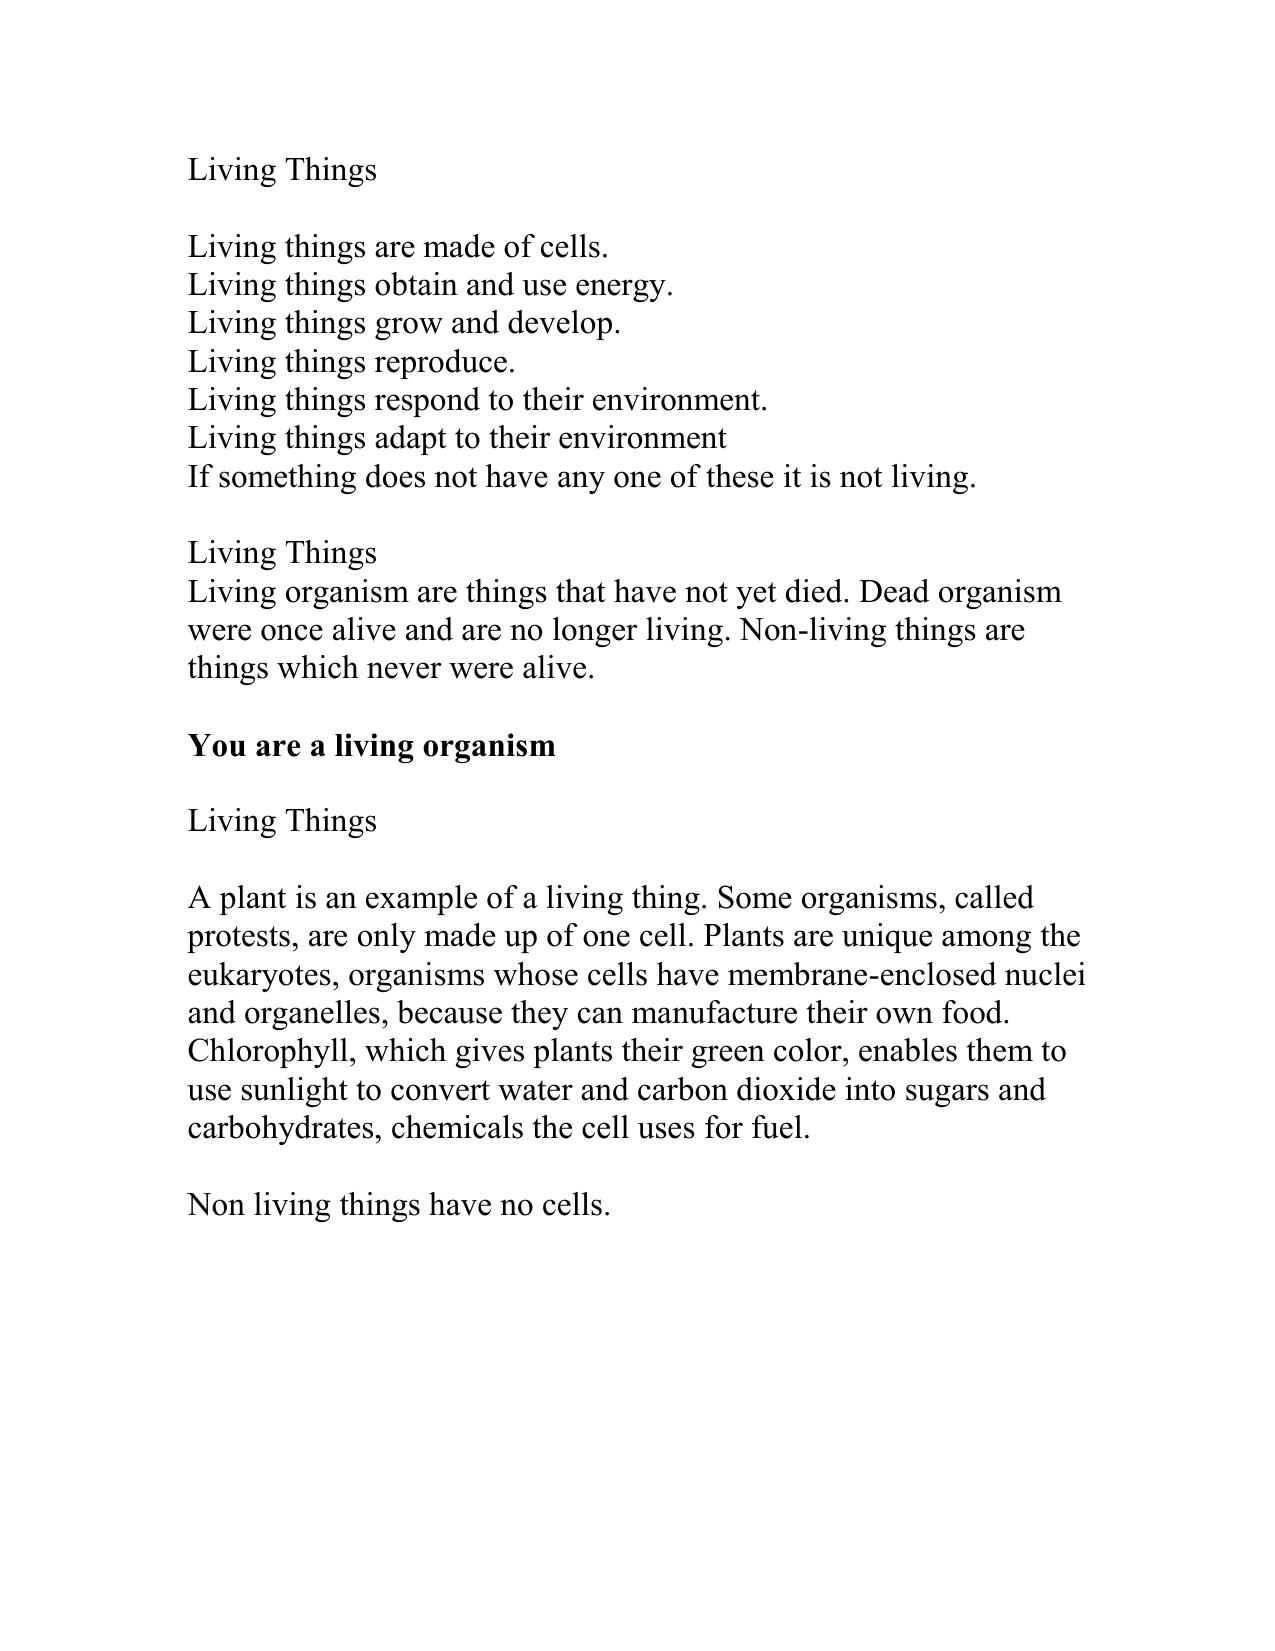 Living Things Hrsbstaff Ednet Ns Ca